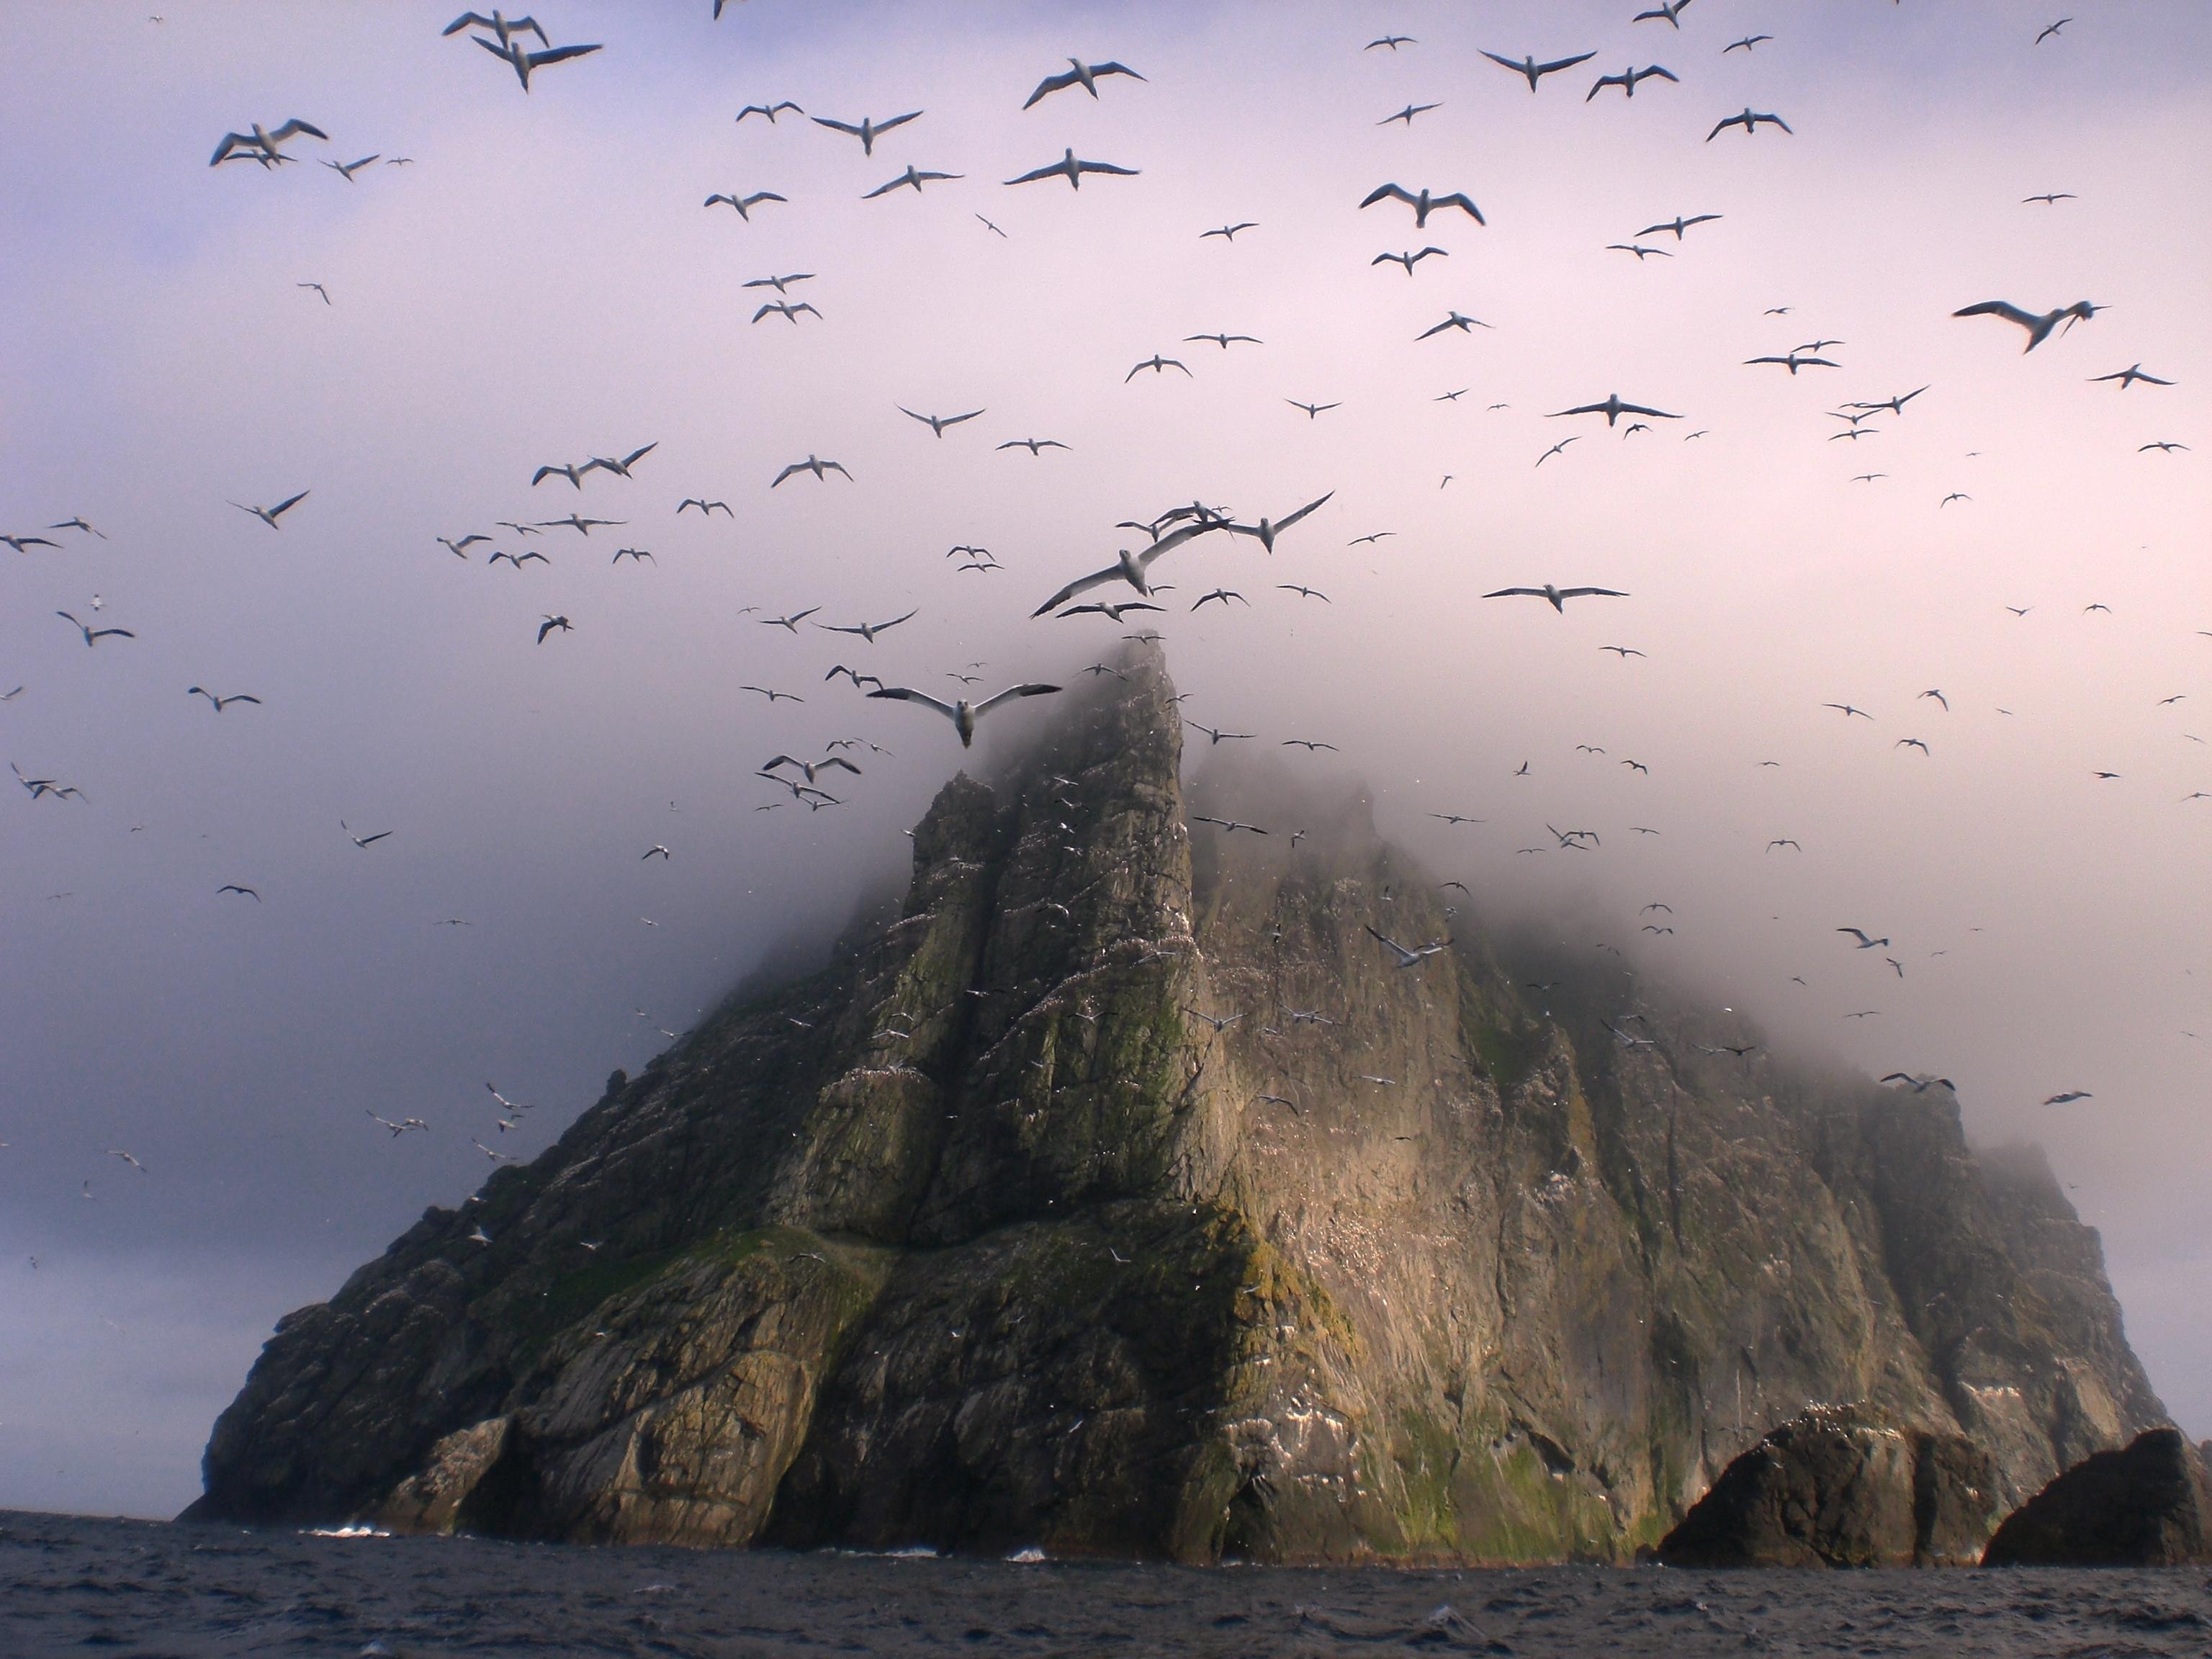 Bird Cliff Flock Of Birds Island Scotland Seagull 3072x2304